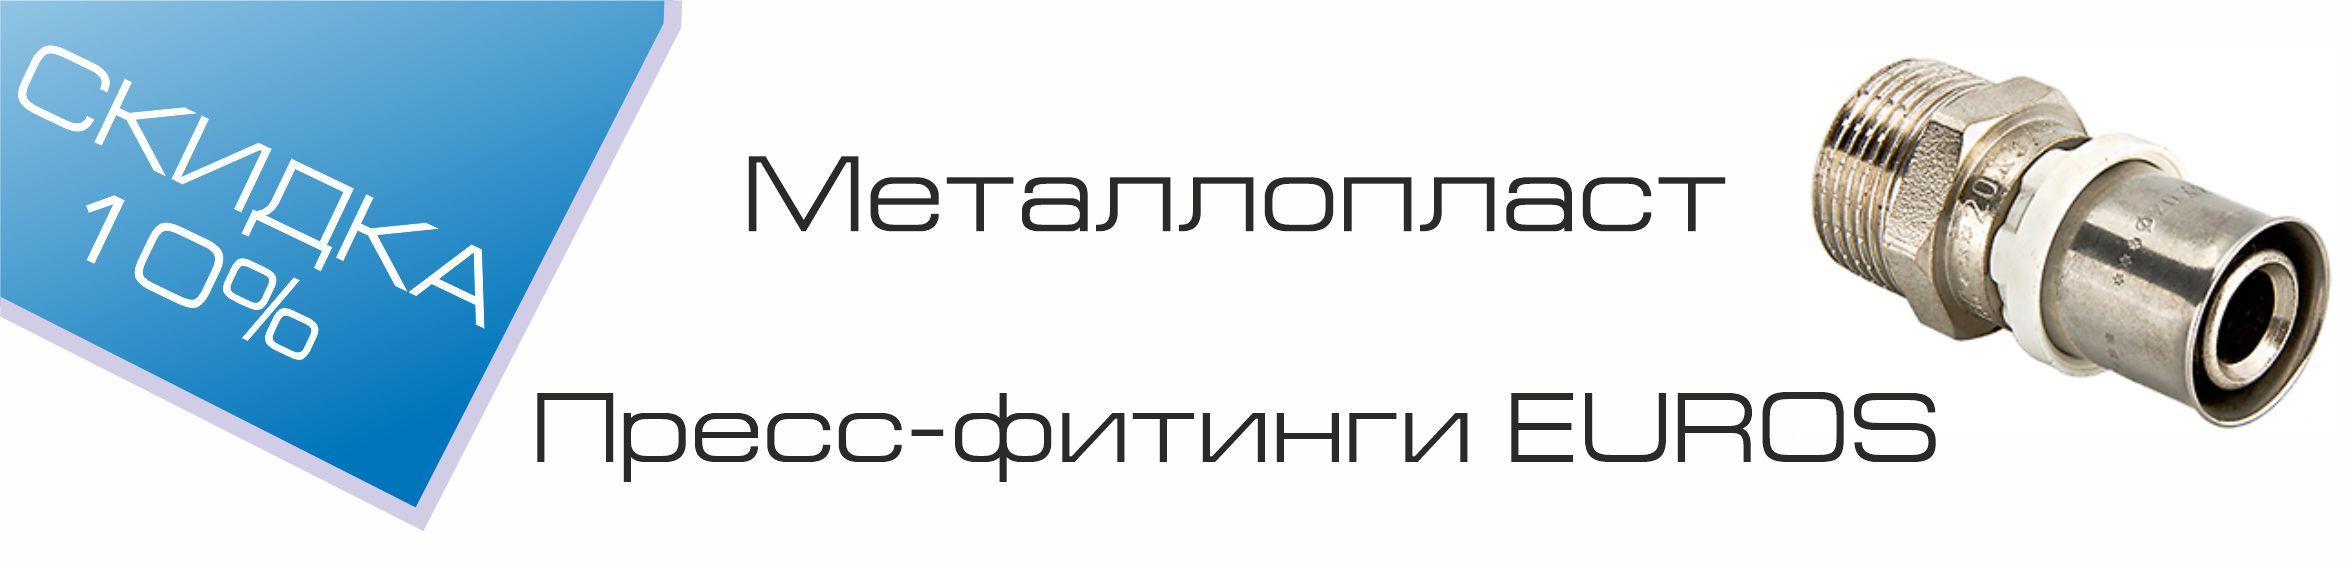 Металлопласт EUROS Череповец